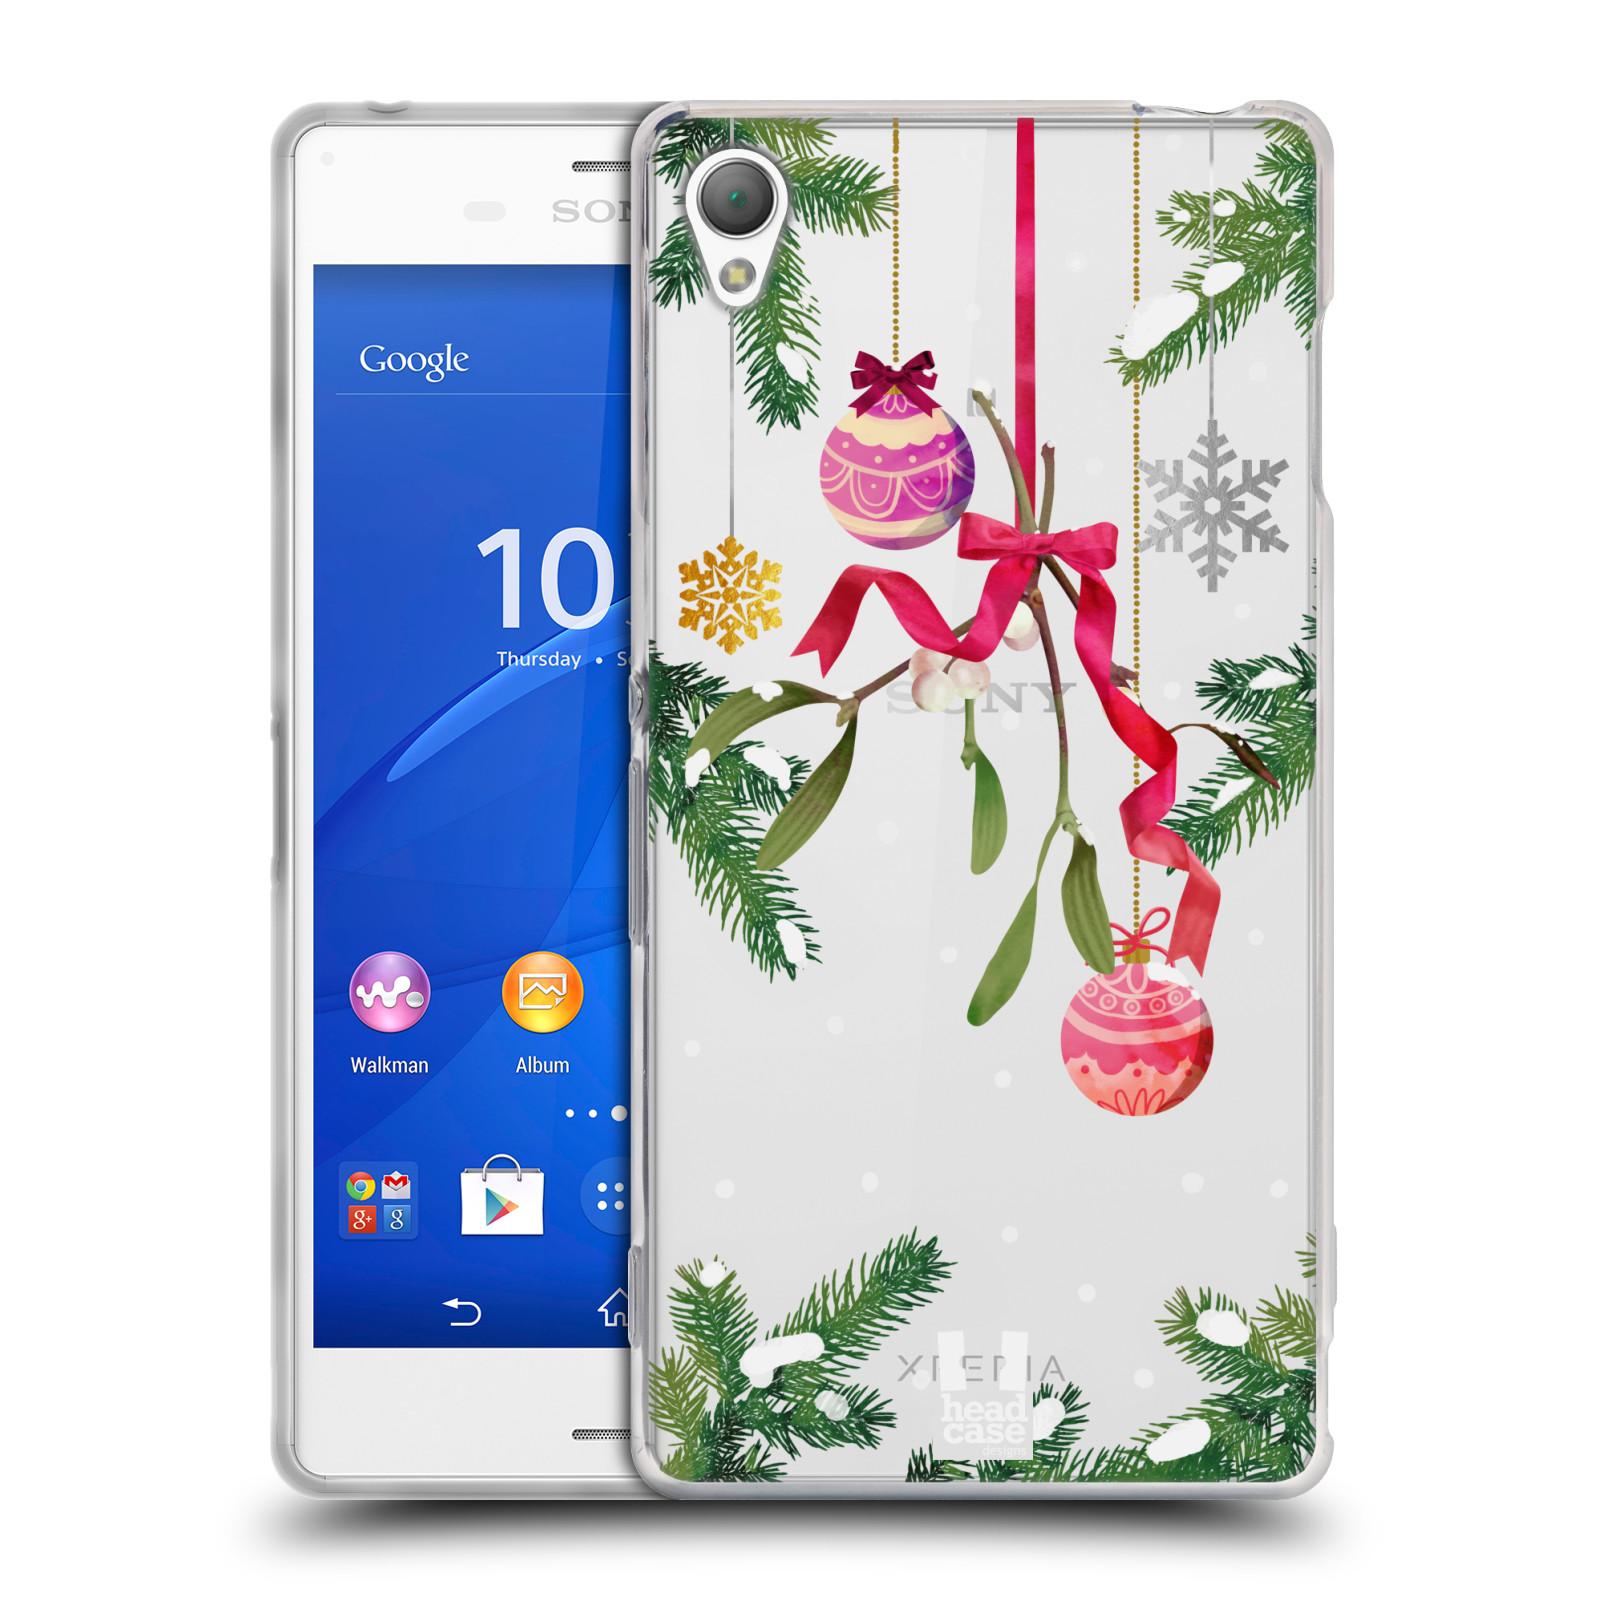 Silikonové pouzdro na mobil Sony Xperia Z3 D6603 - Head Case - Větvičky a vánoční ozdoby